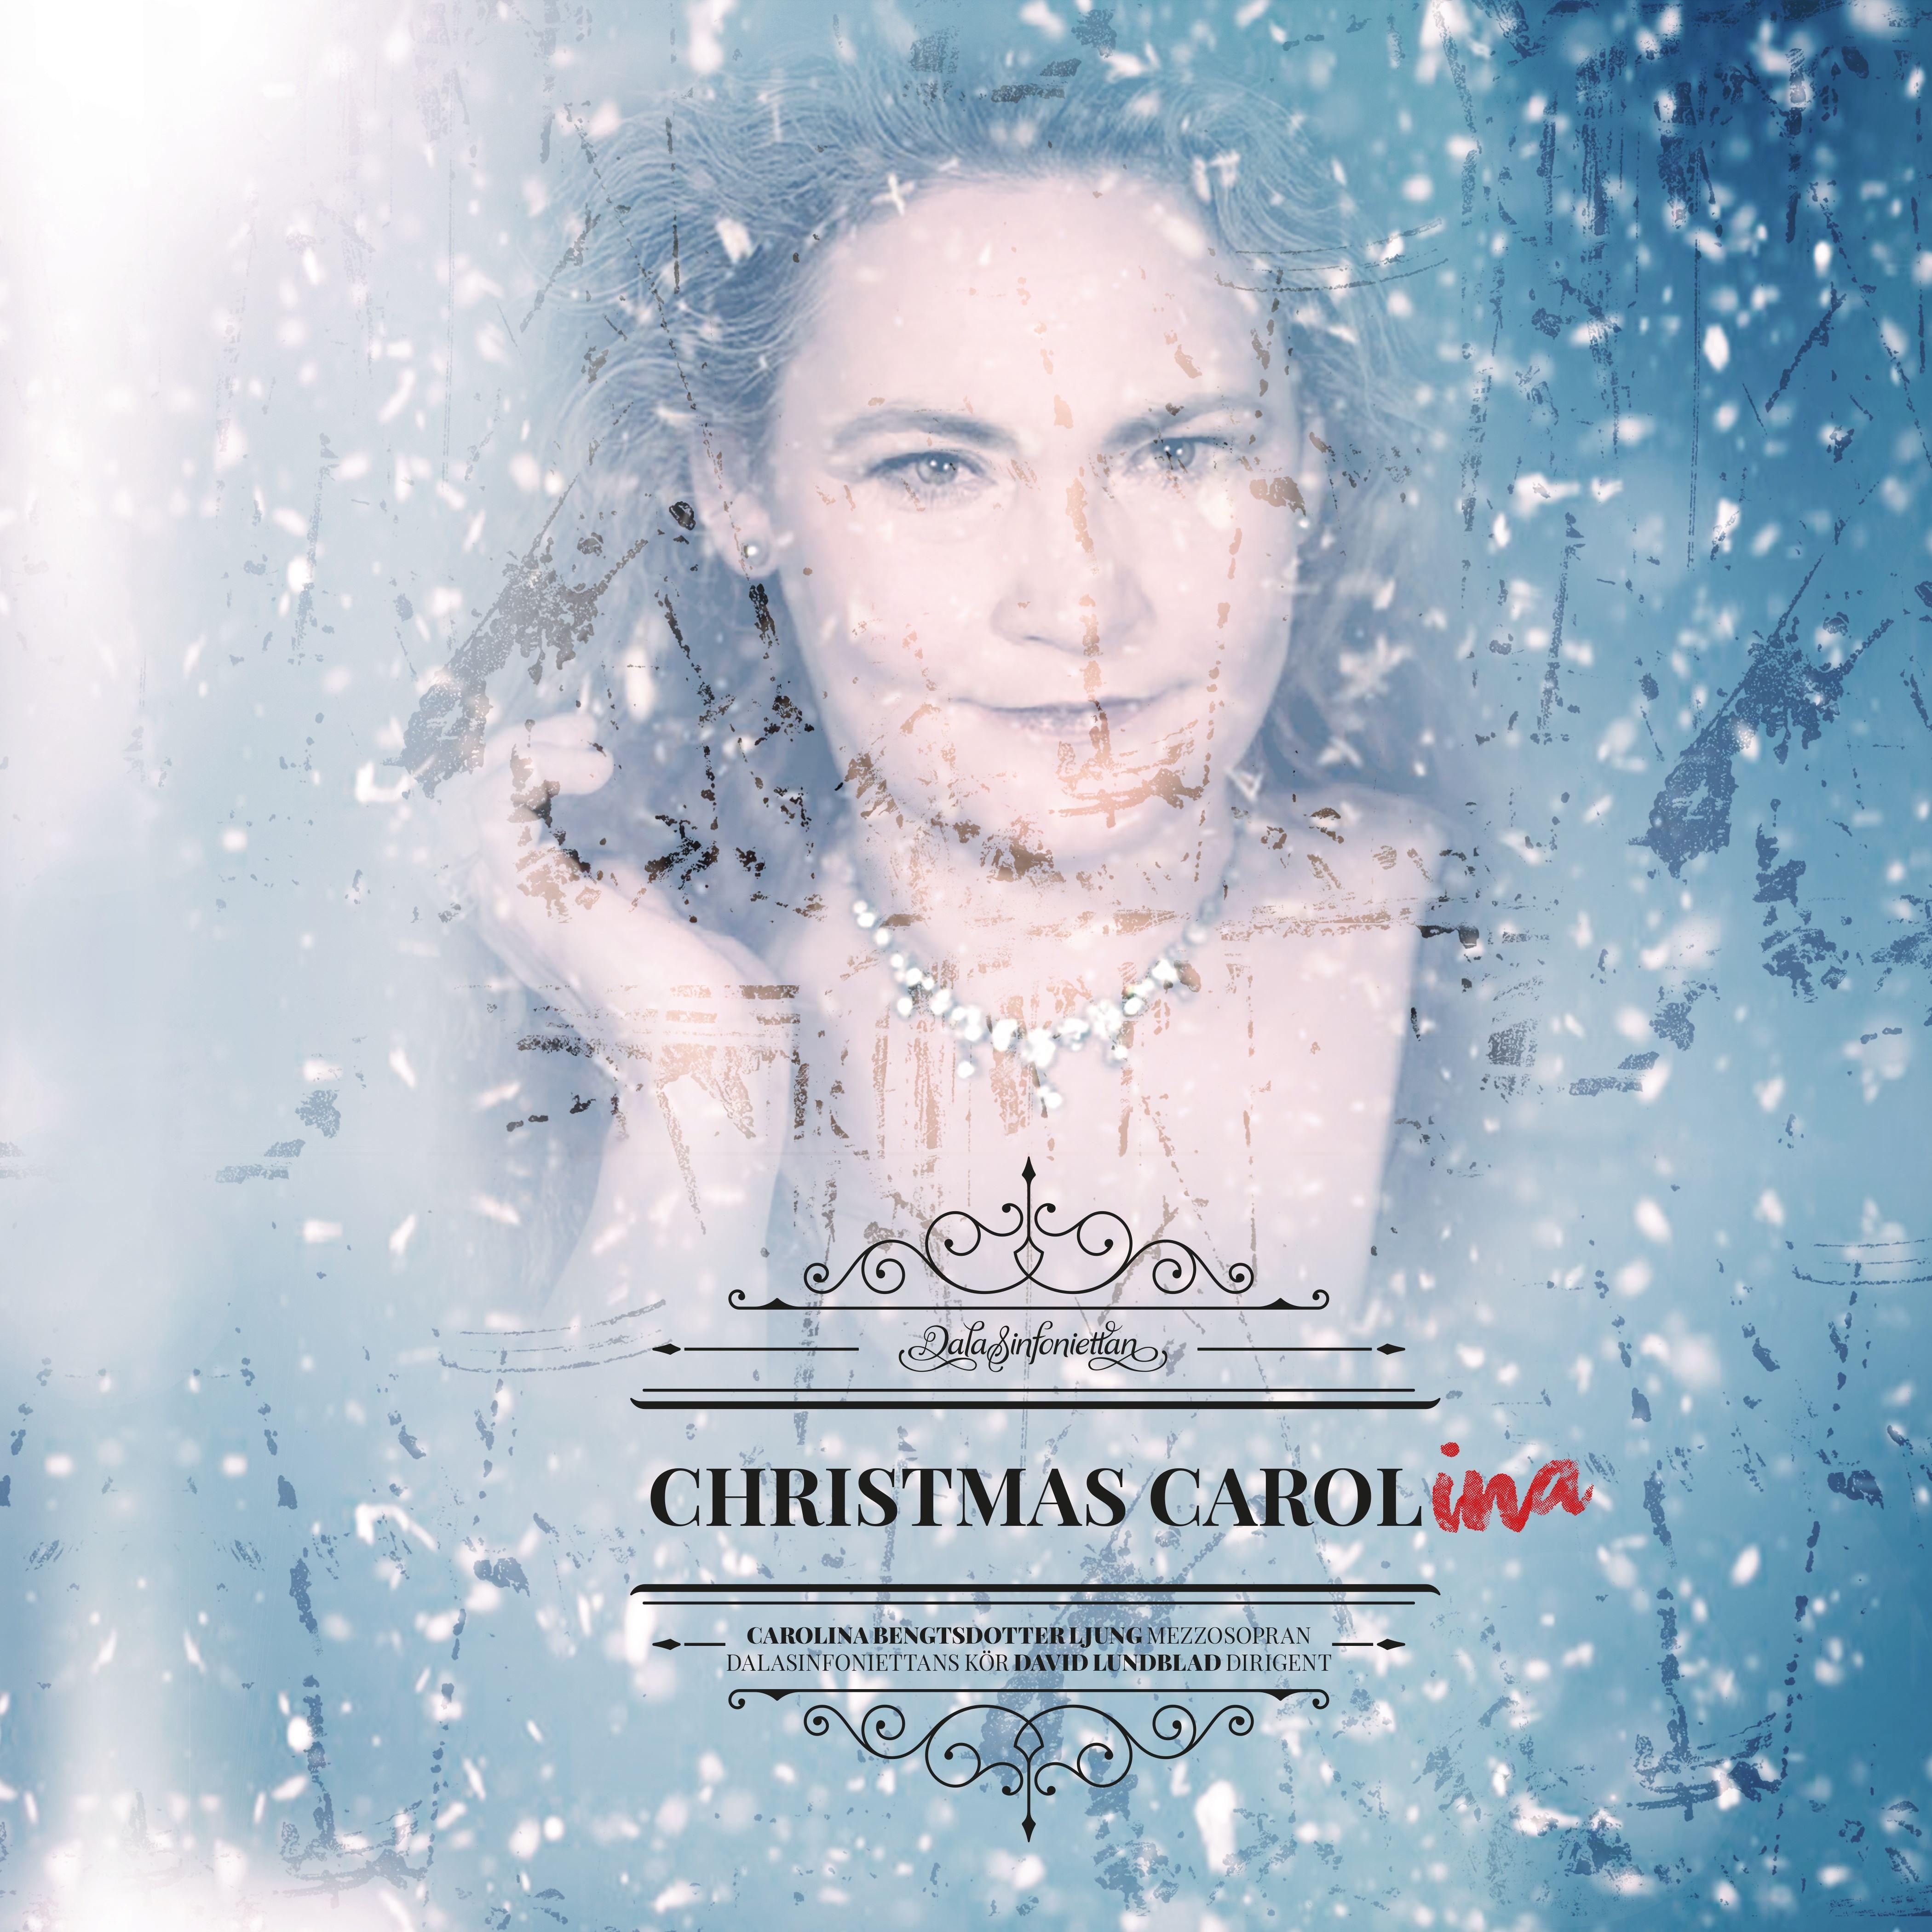 Christmas Carolina Julkonsert